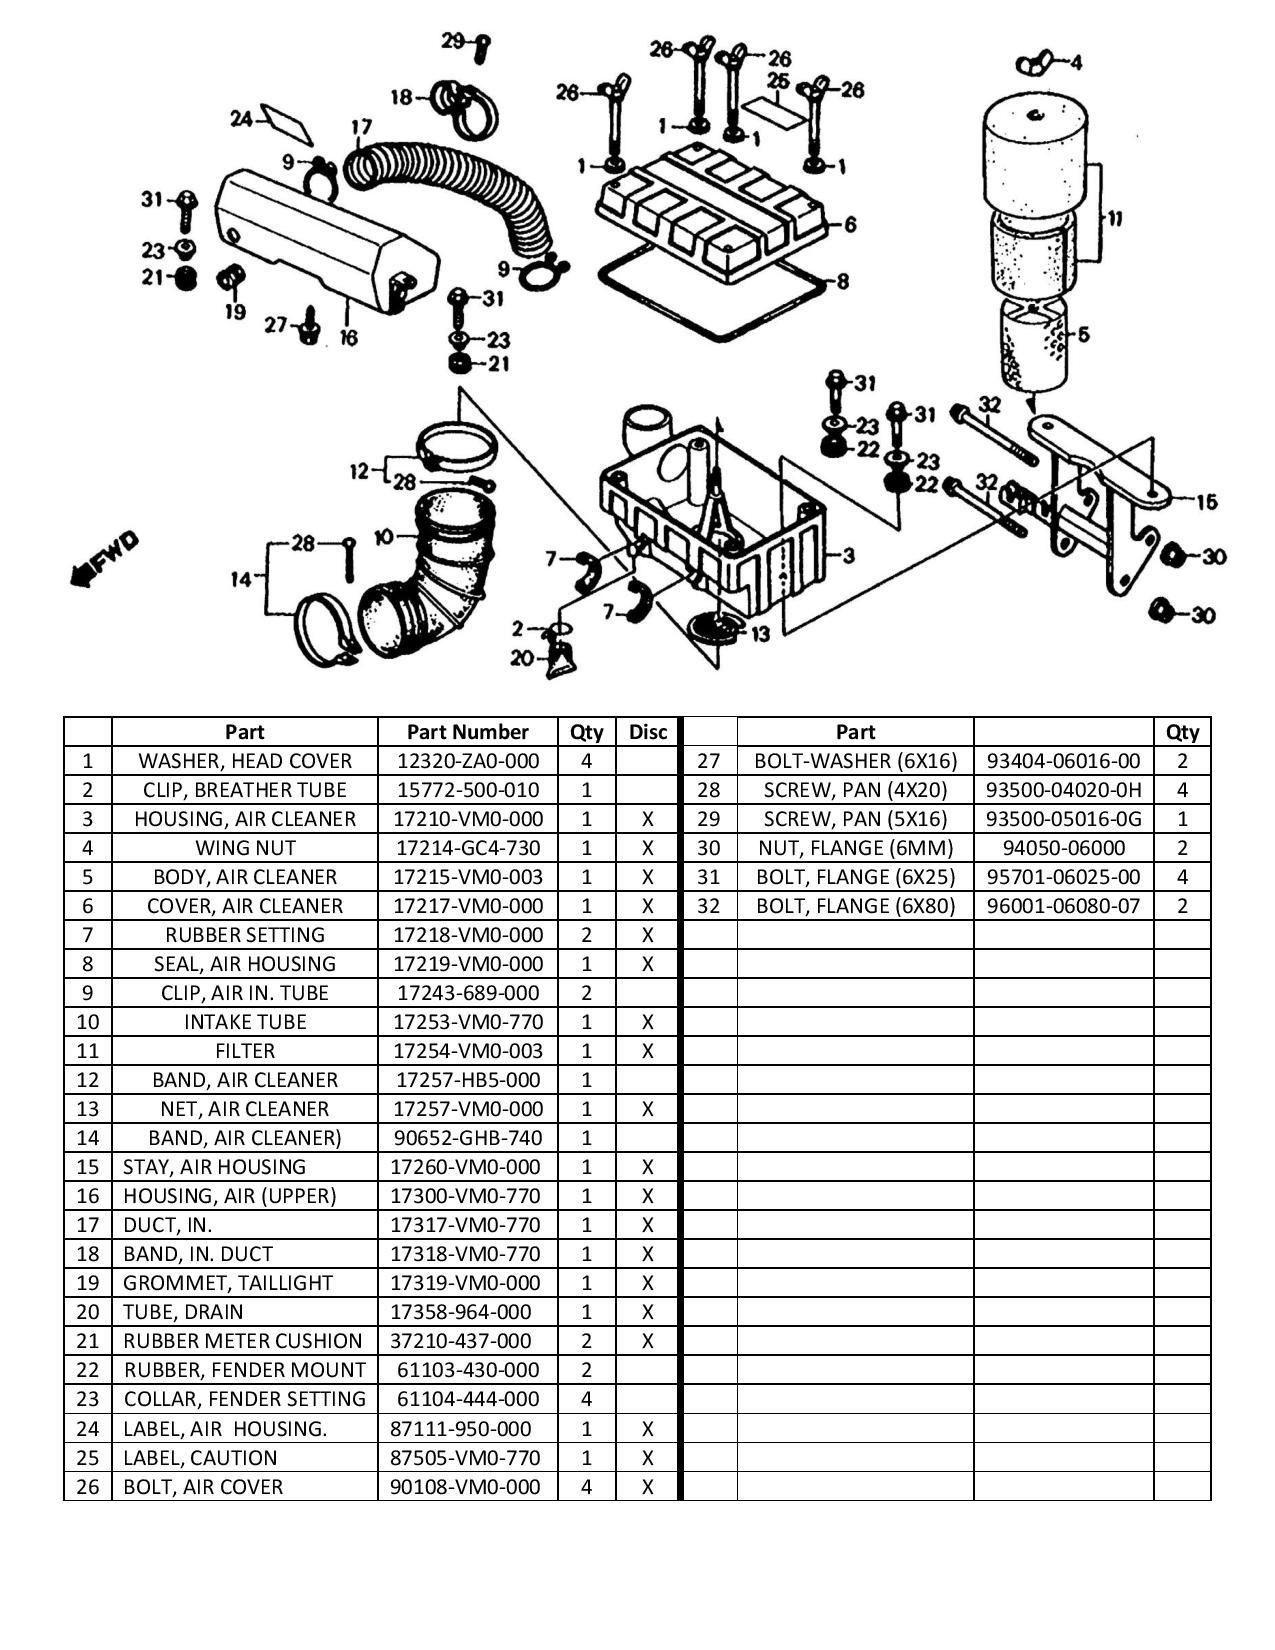 Honda Odyssey Fl350 Air Intake Diagram And Parts List Atv Parts Honda Atv